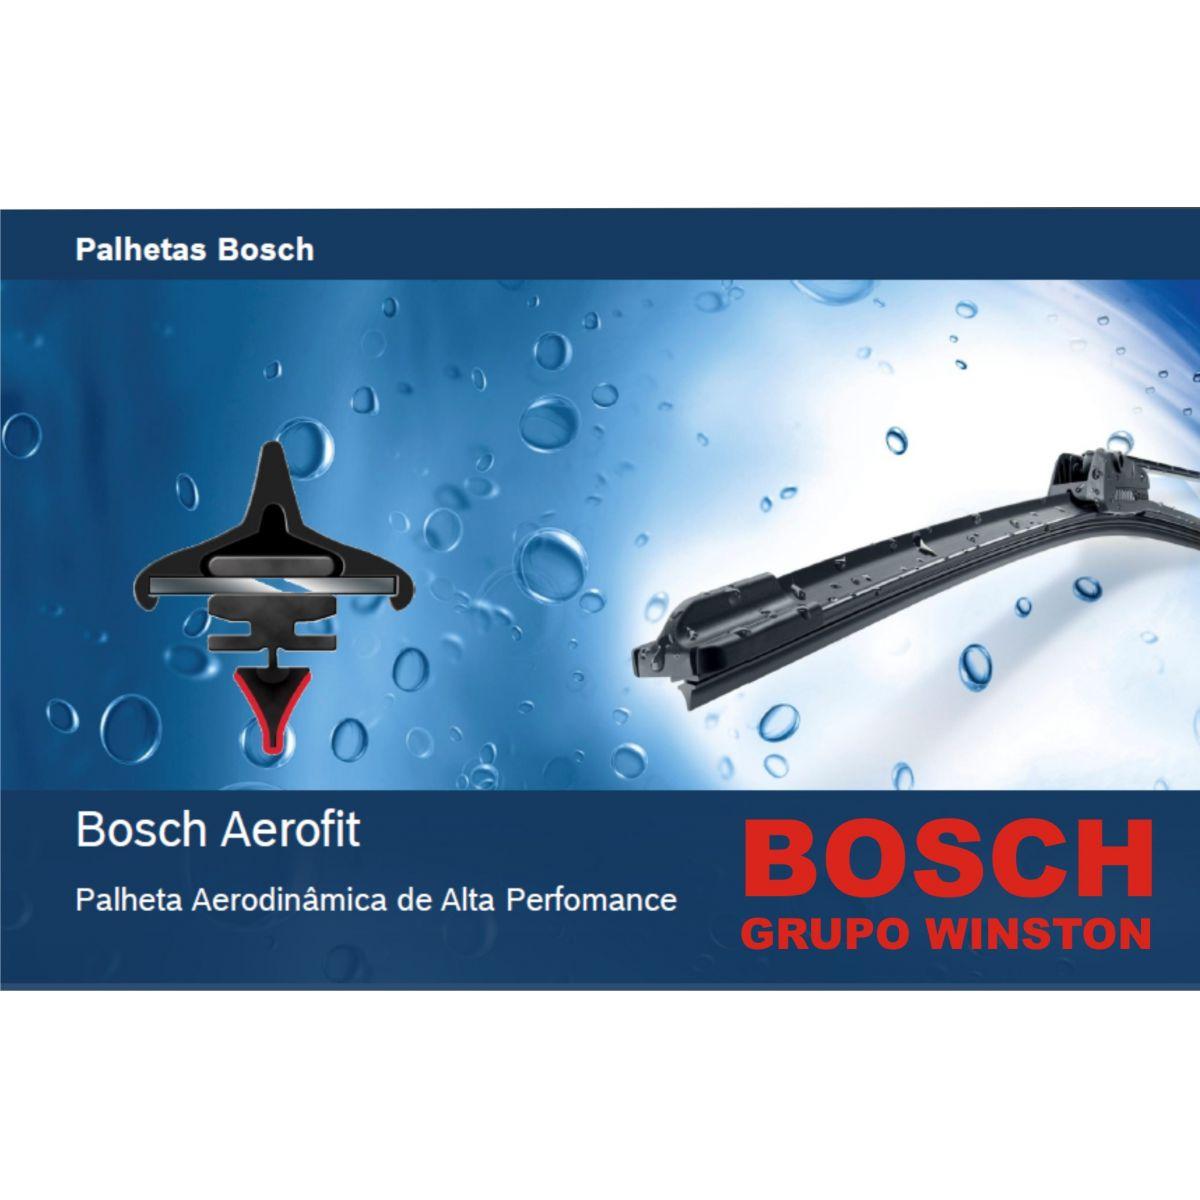 Palheta Bosch Aerofit Limpador de para brisa Bosch LIFAN 320